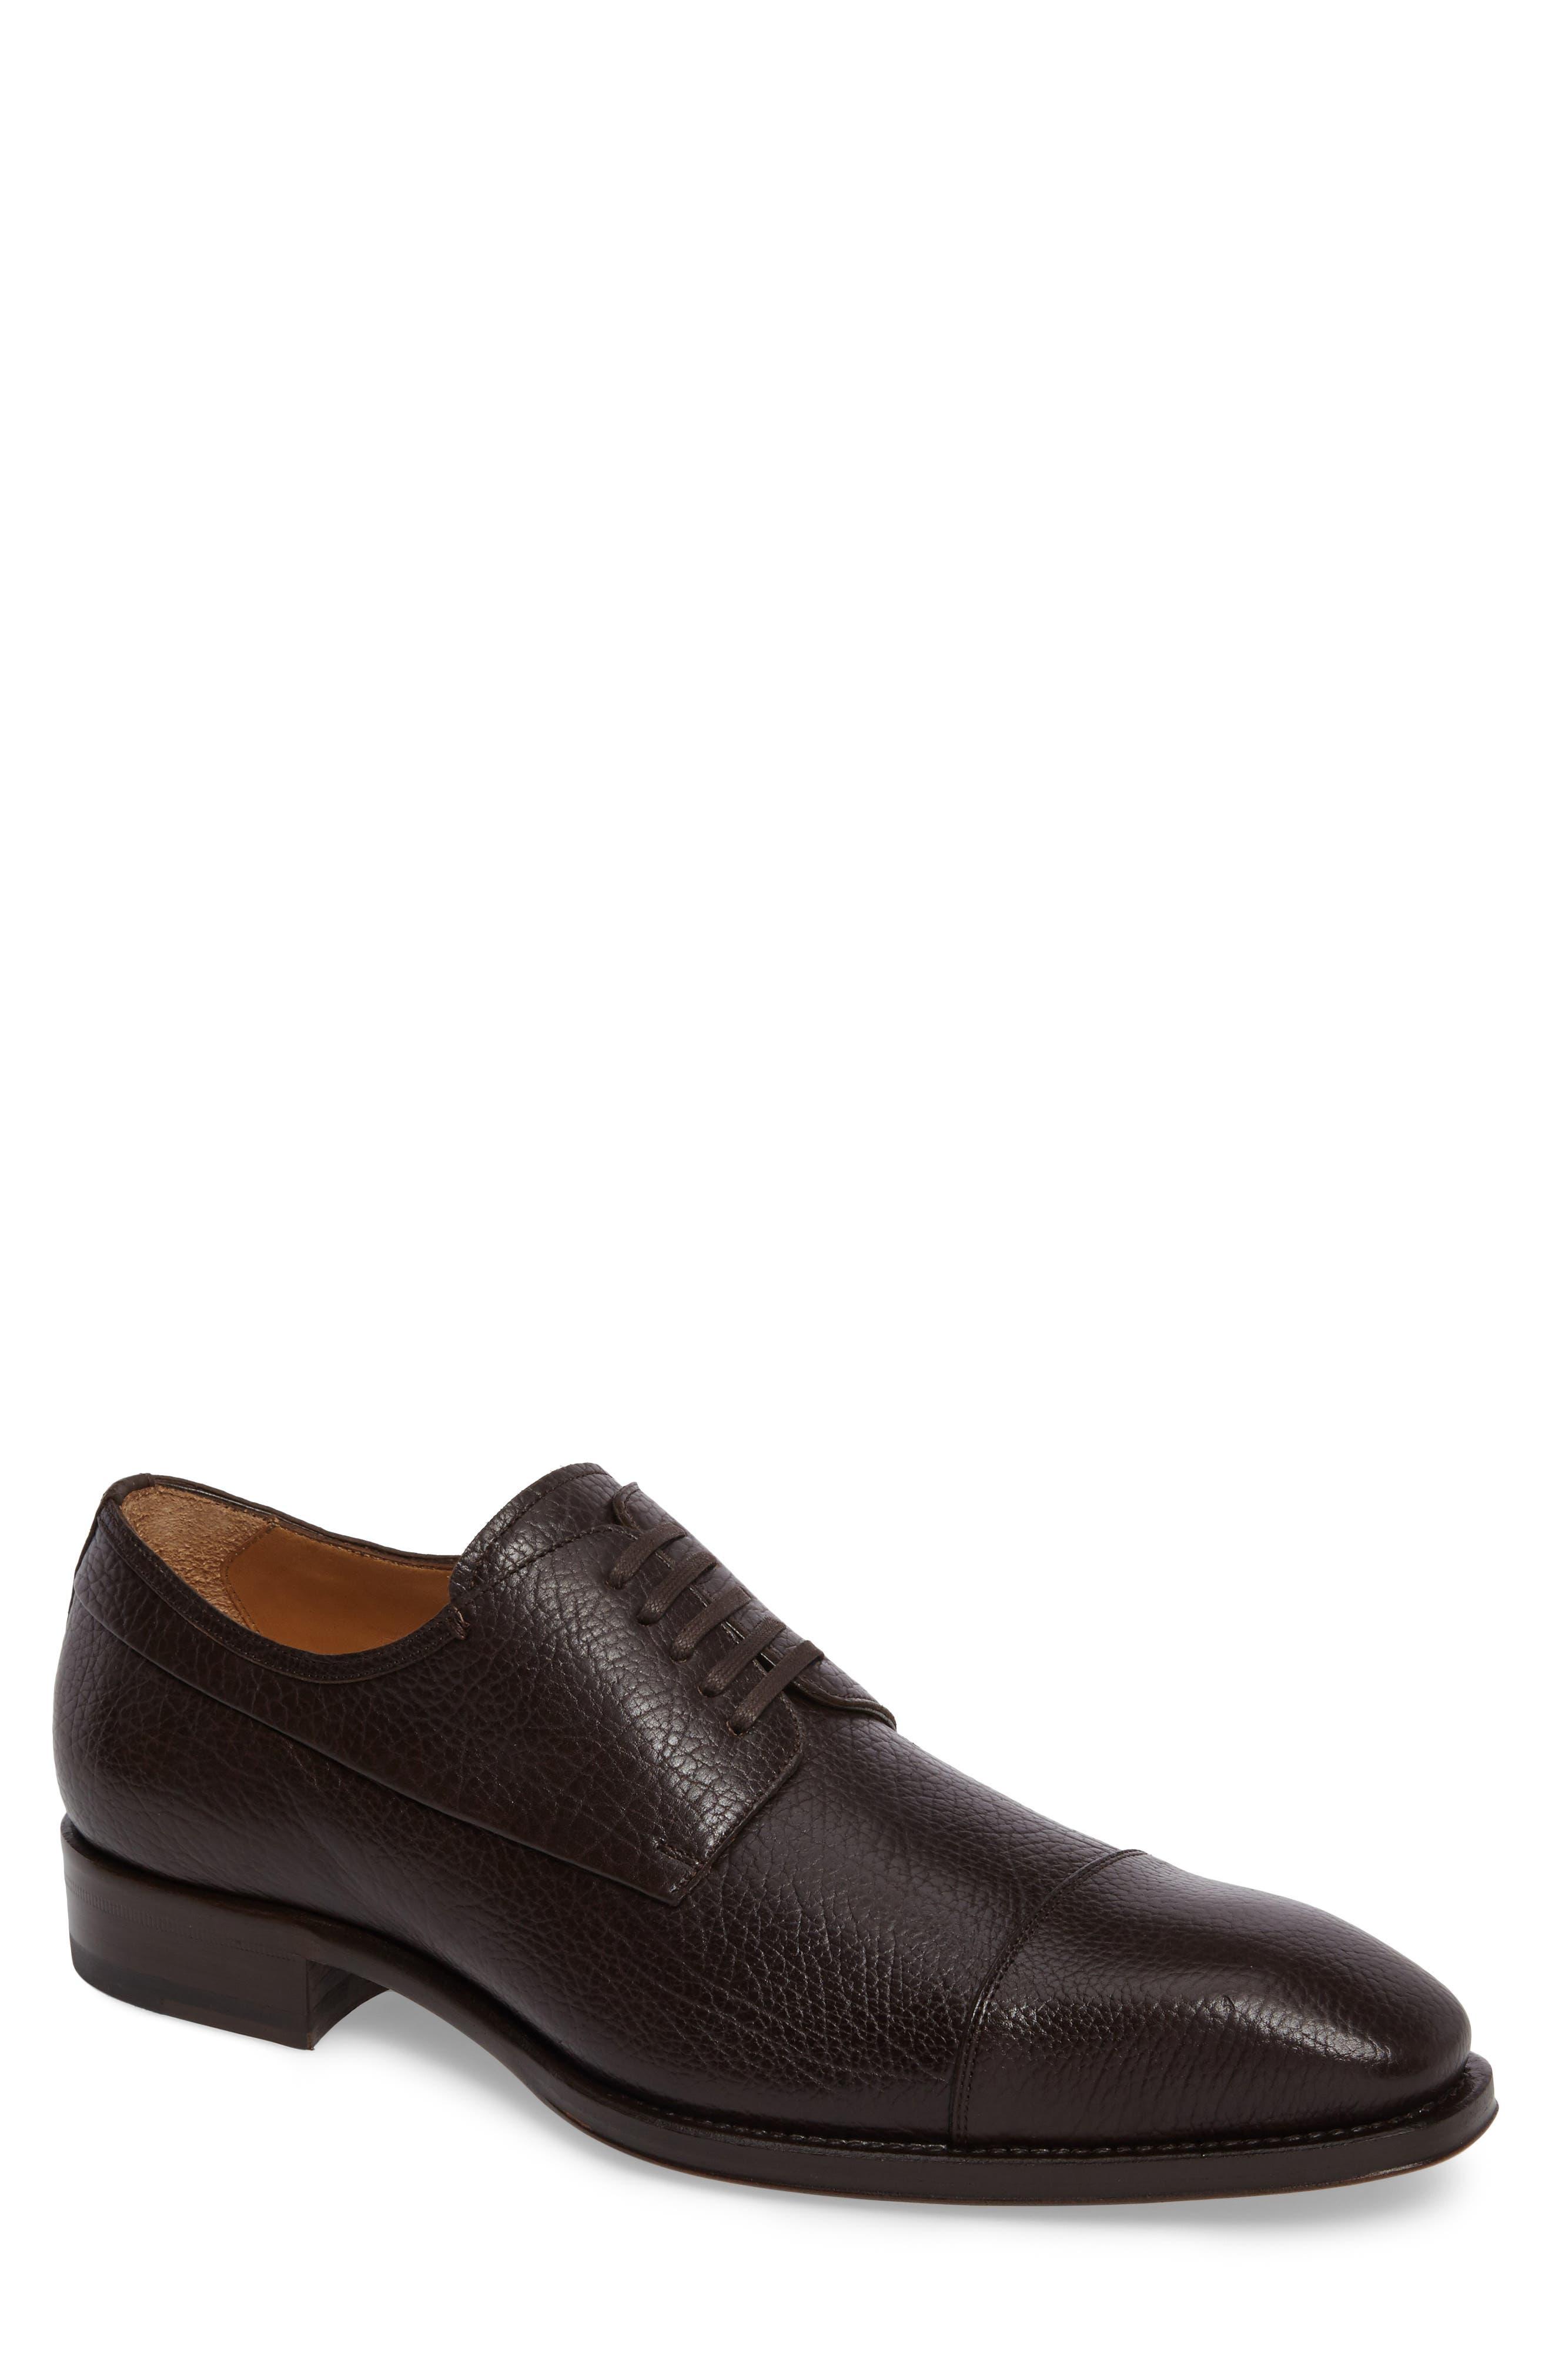 Pulpi Cap Toe Derby,                         Main,                         color, Brown Leather